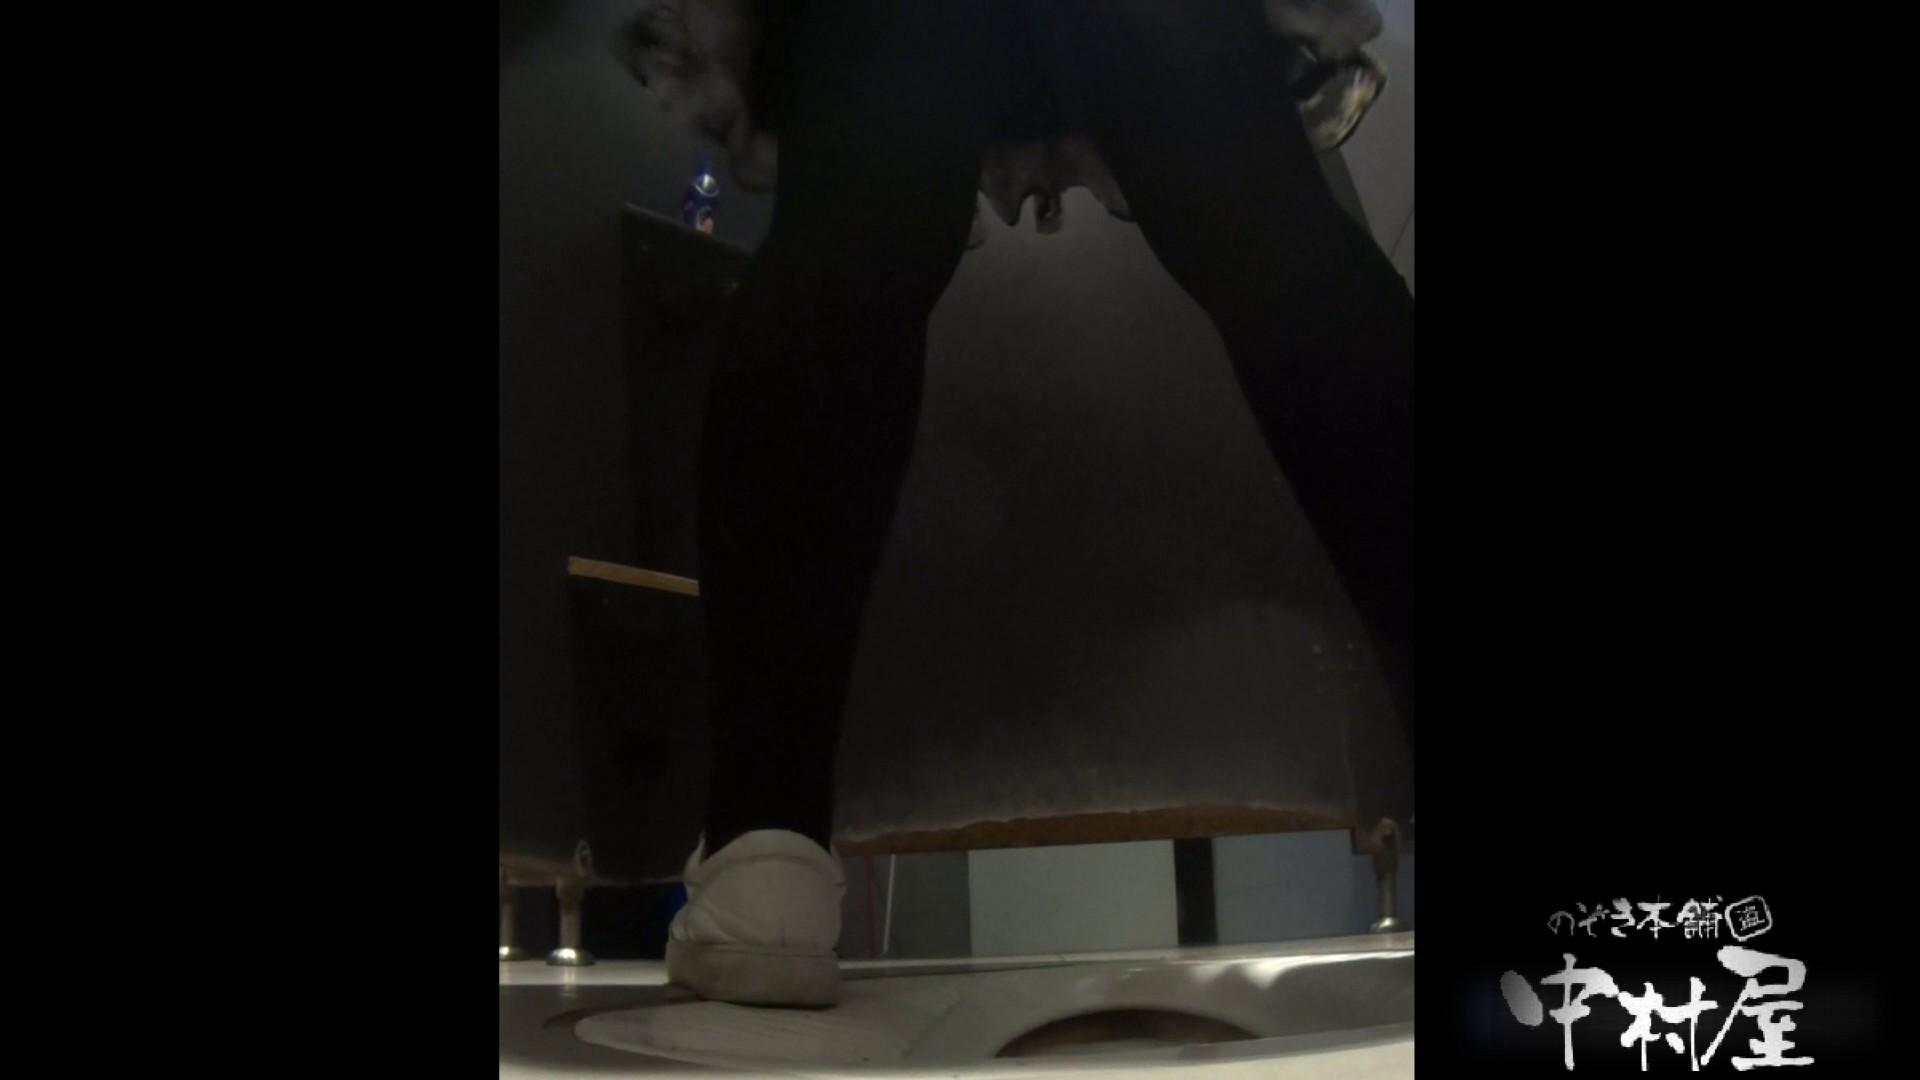 大学休憩時間の洗面所事情21 盗撮シリーズ  108PIX 76